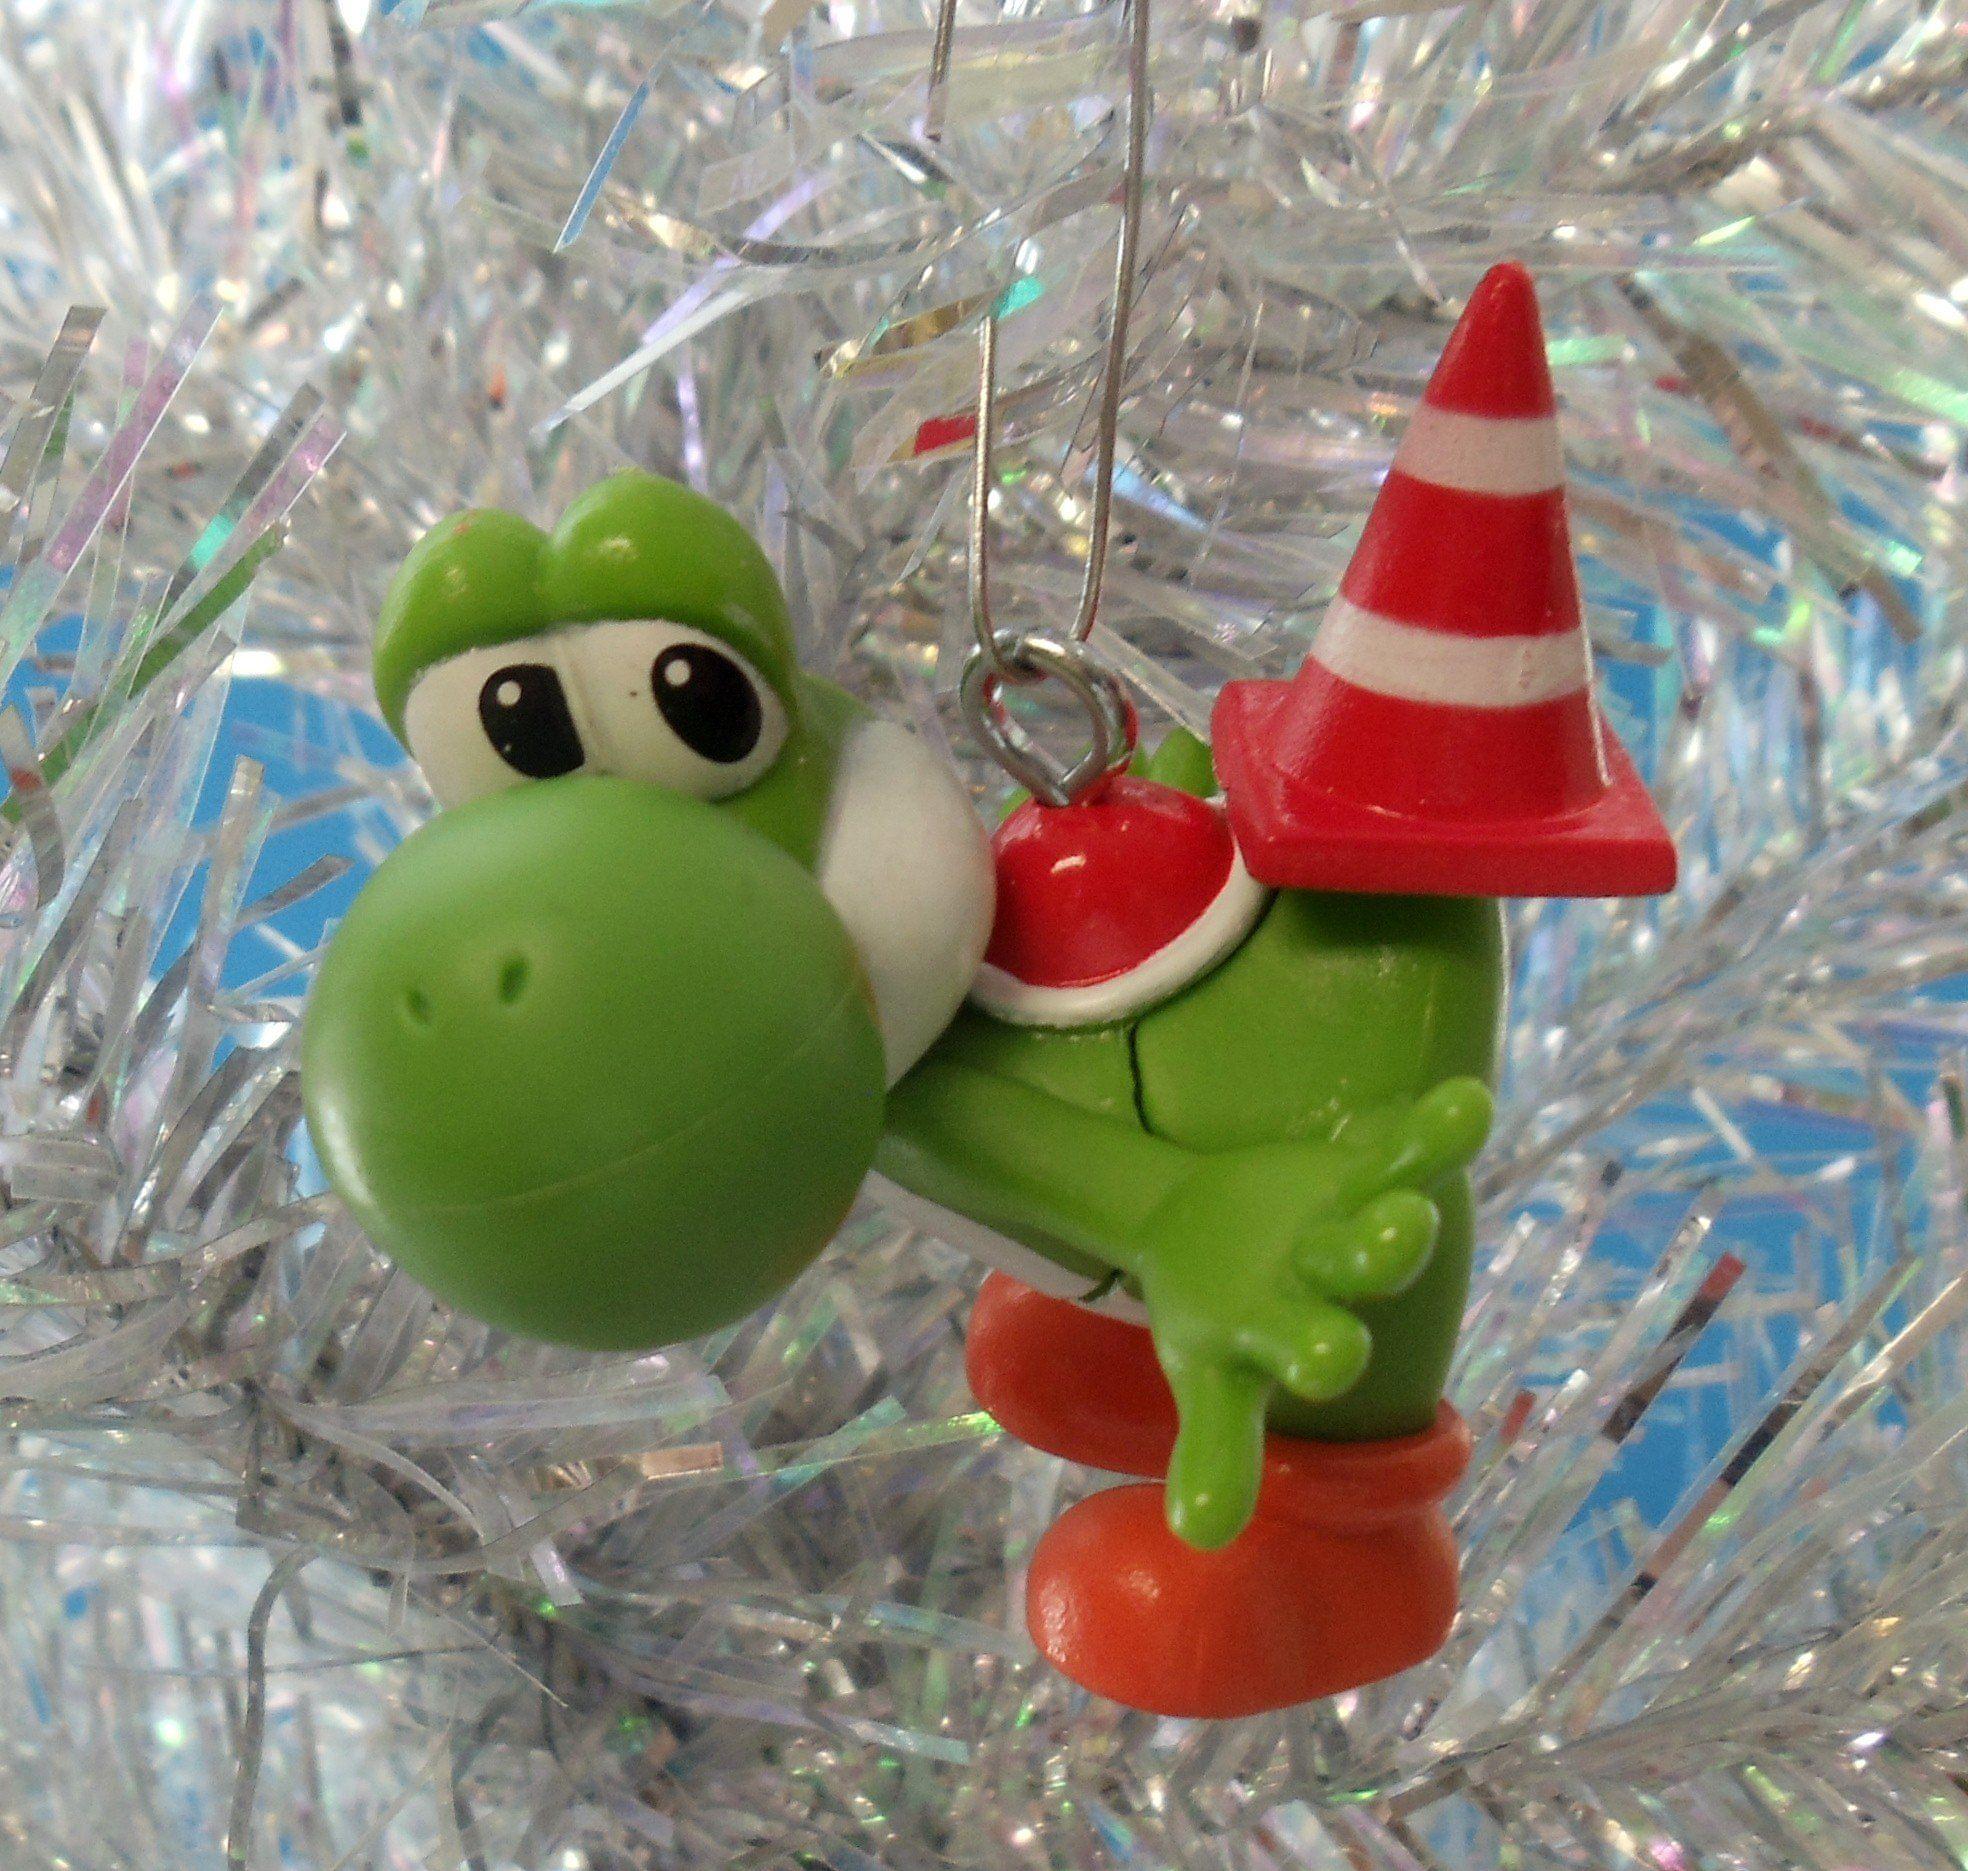 Christmas Mario Kart.Mario Kart Inspired Racing Super Mario Brothers Themed Set